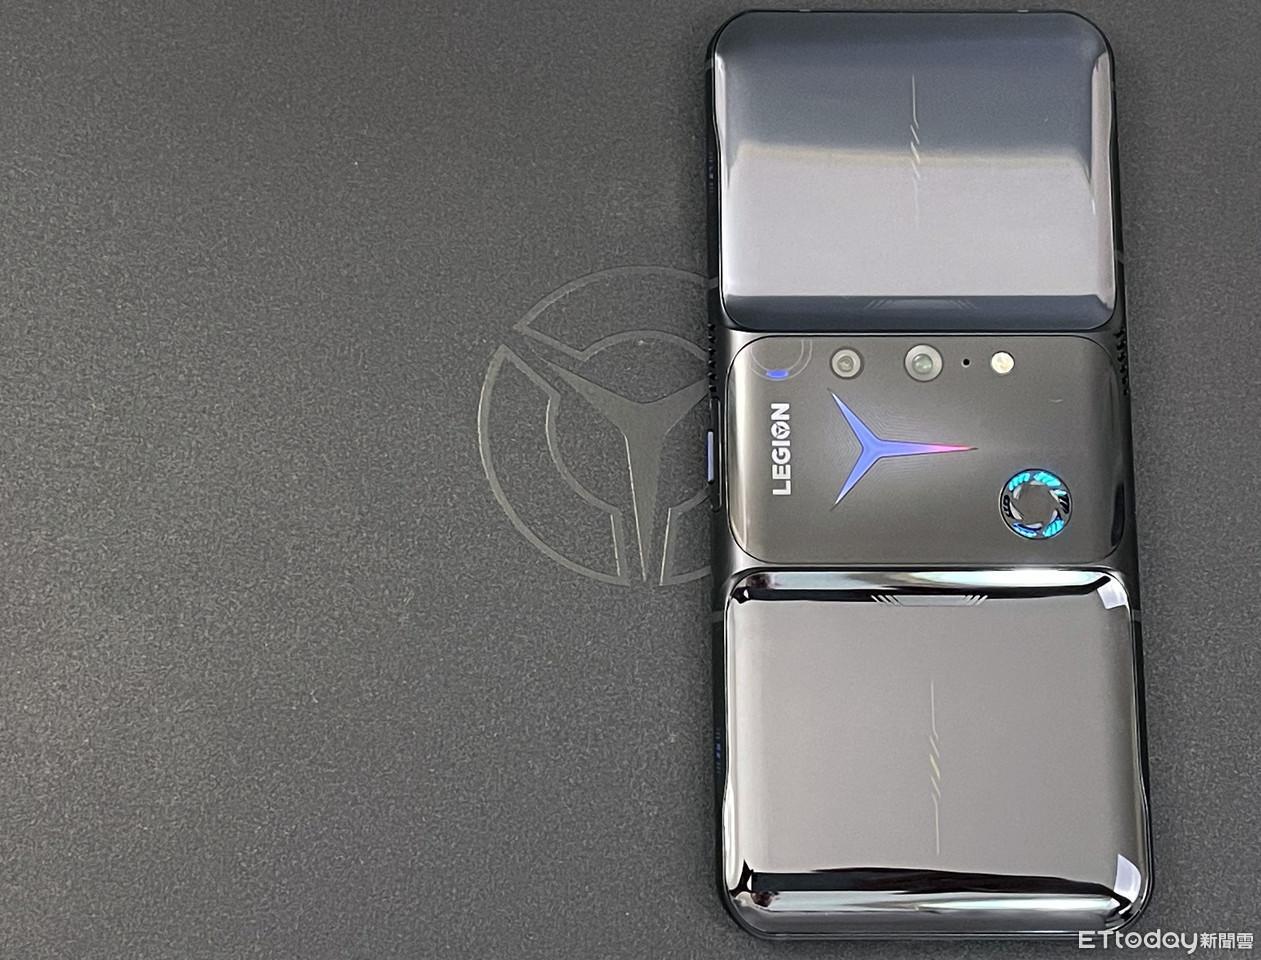 聯想二代手機Legion Phone Duel 2評測:及ROG Phone 5s Pro對比